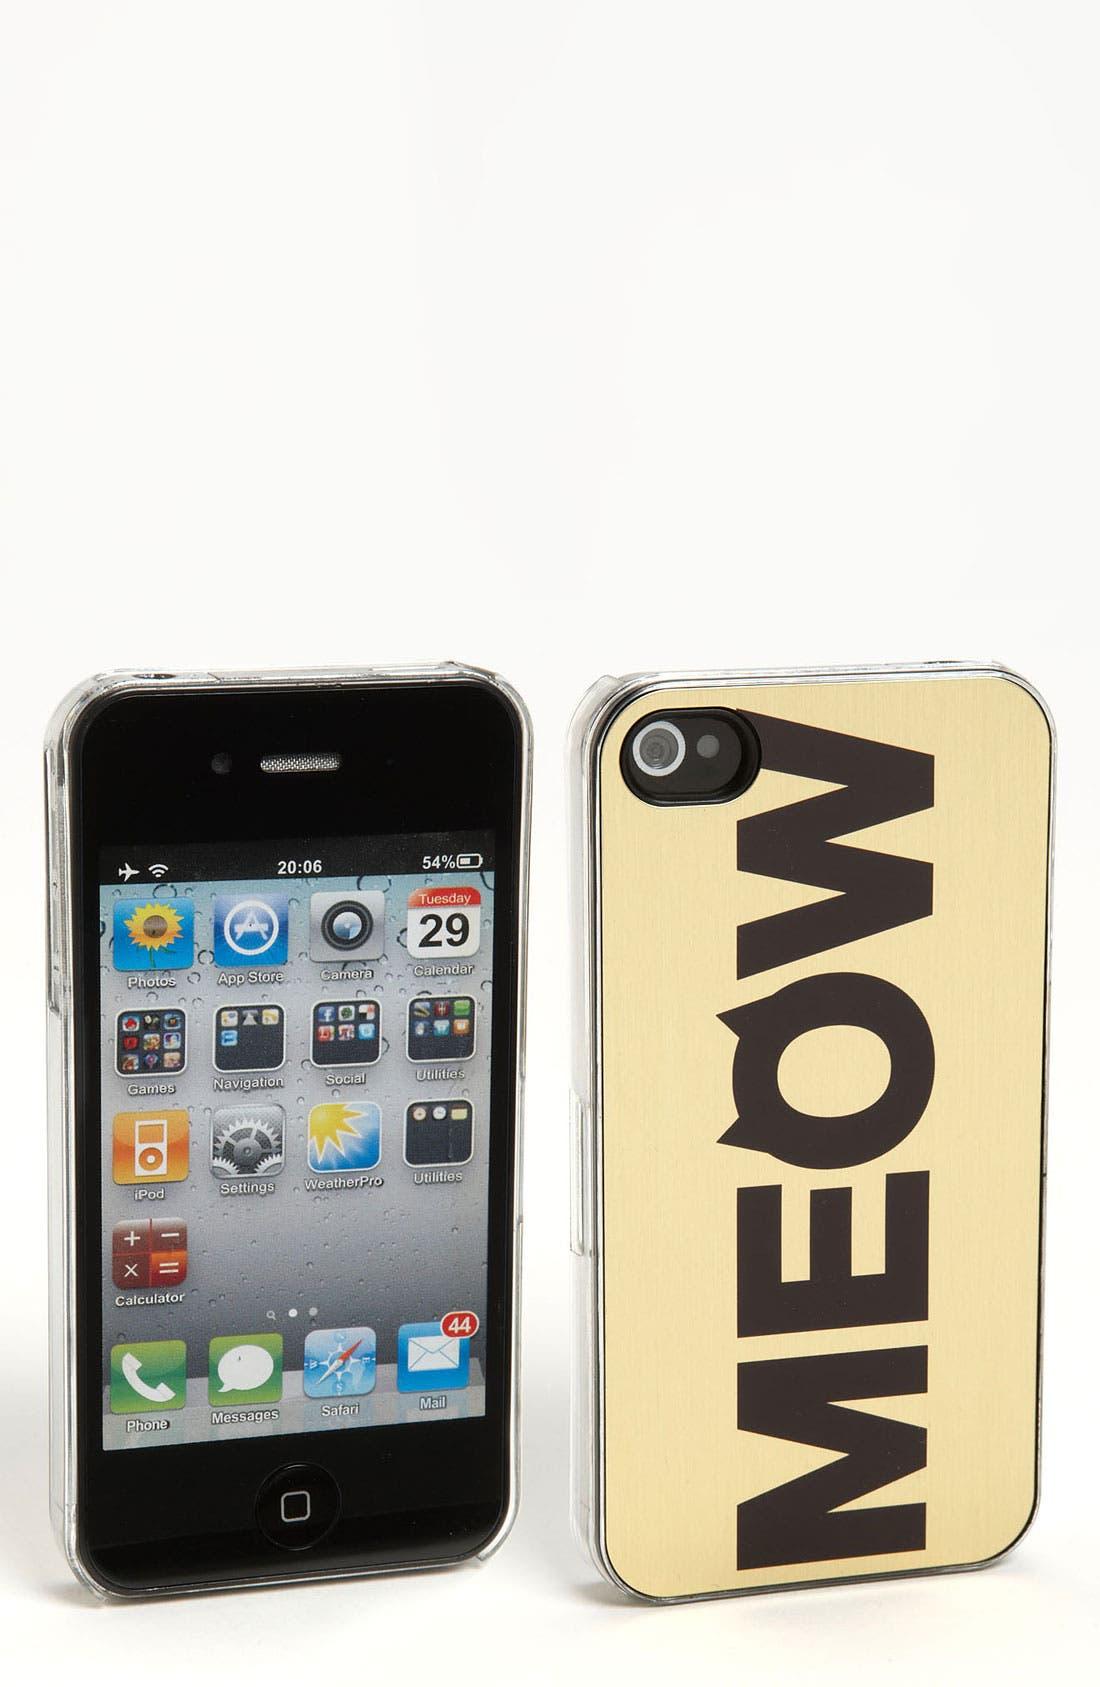 Main Image - ZERO GRAVITY 'Cat Call' iPhone 4 & 4S Case